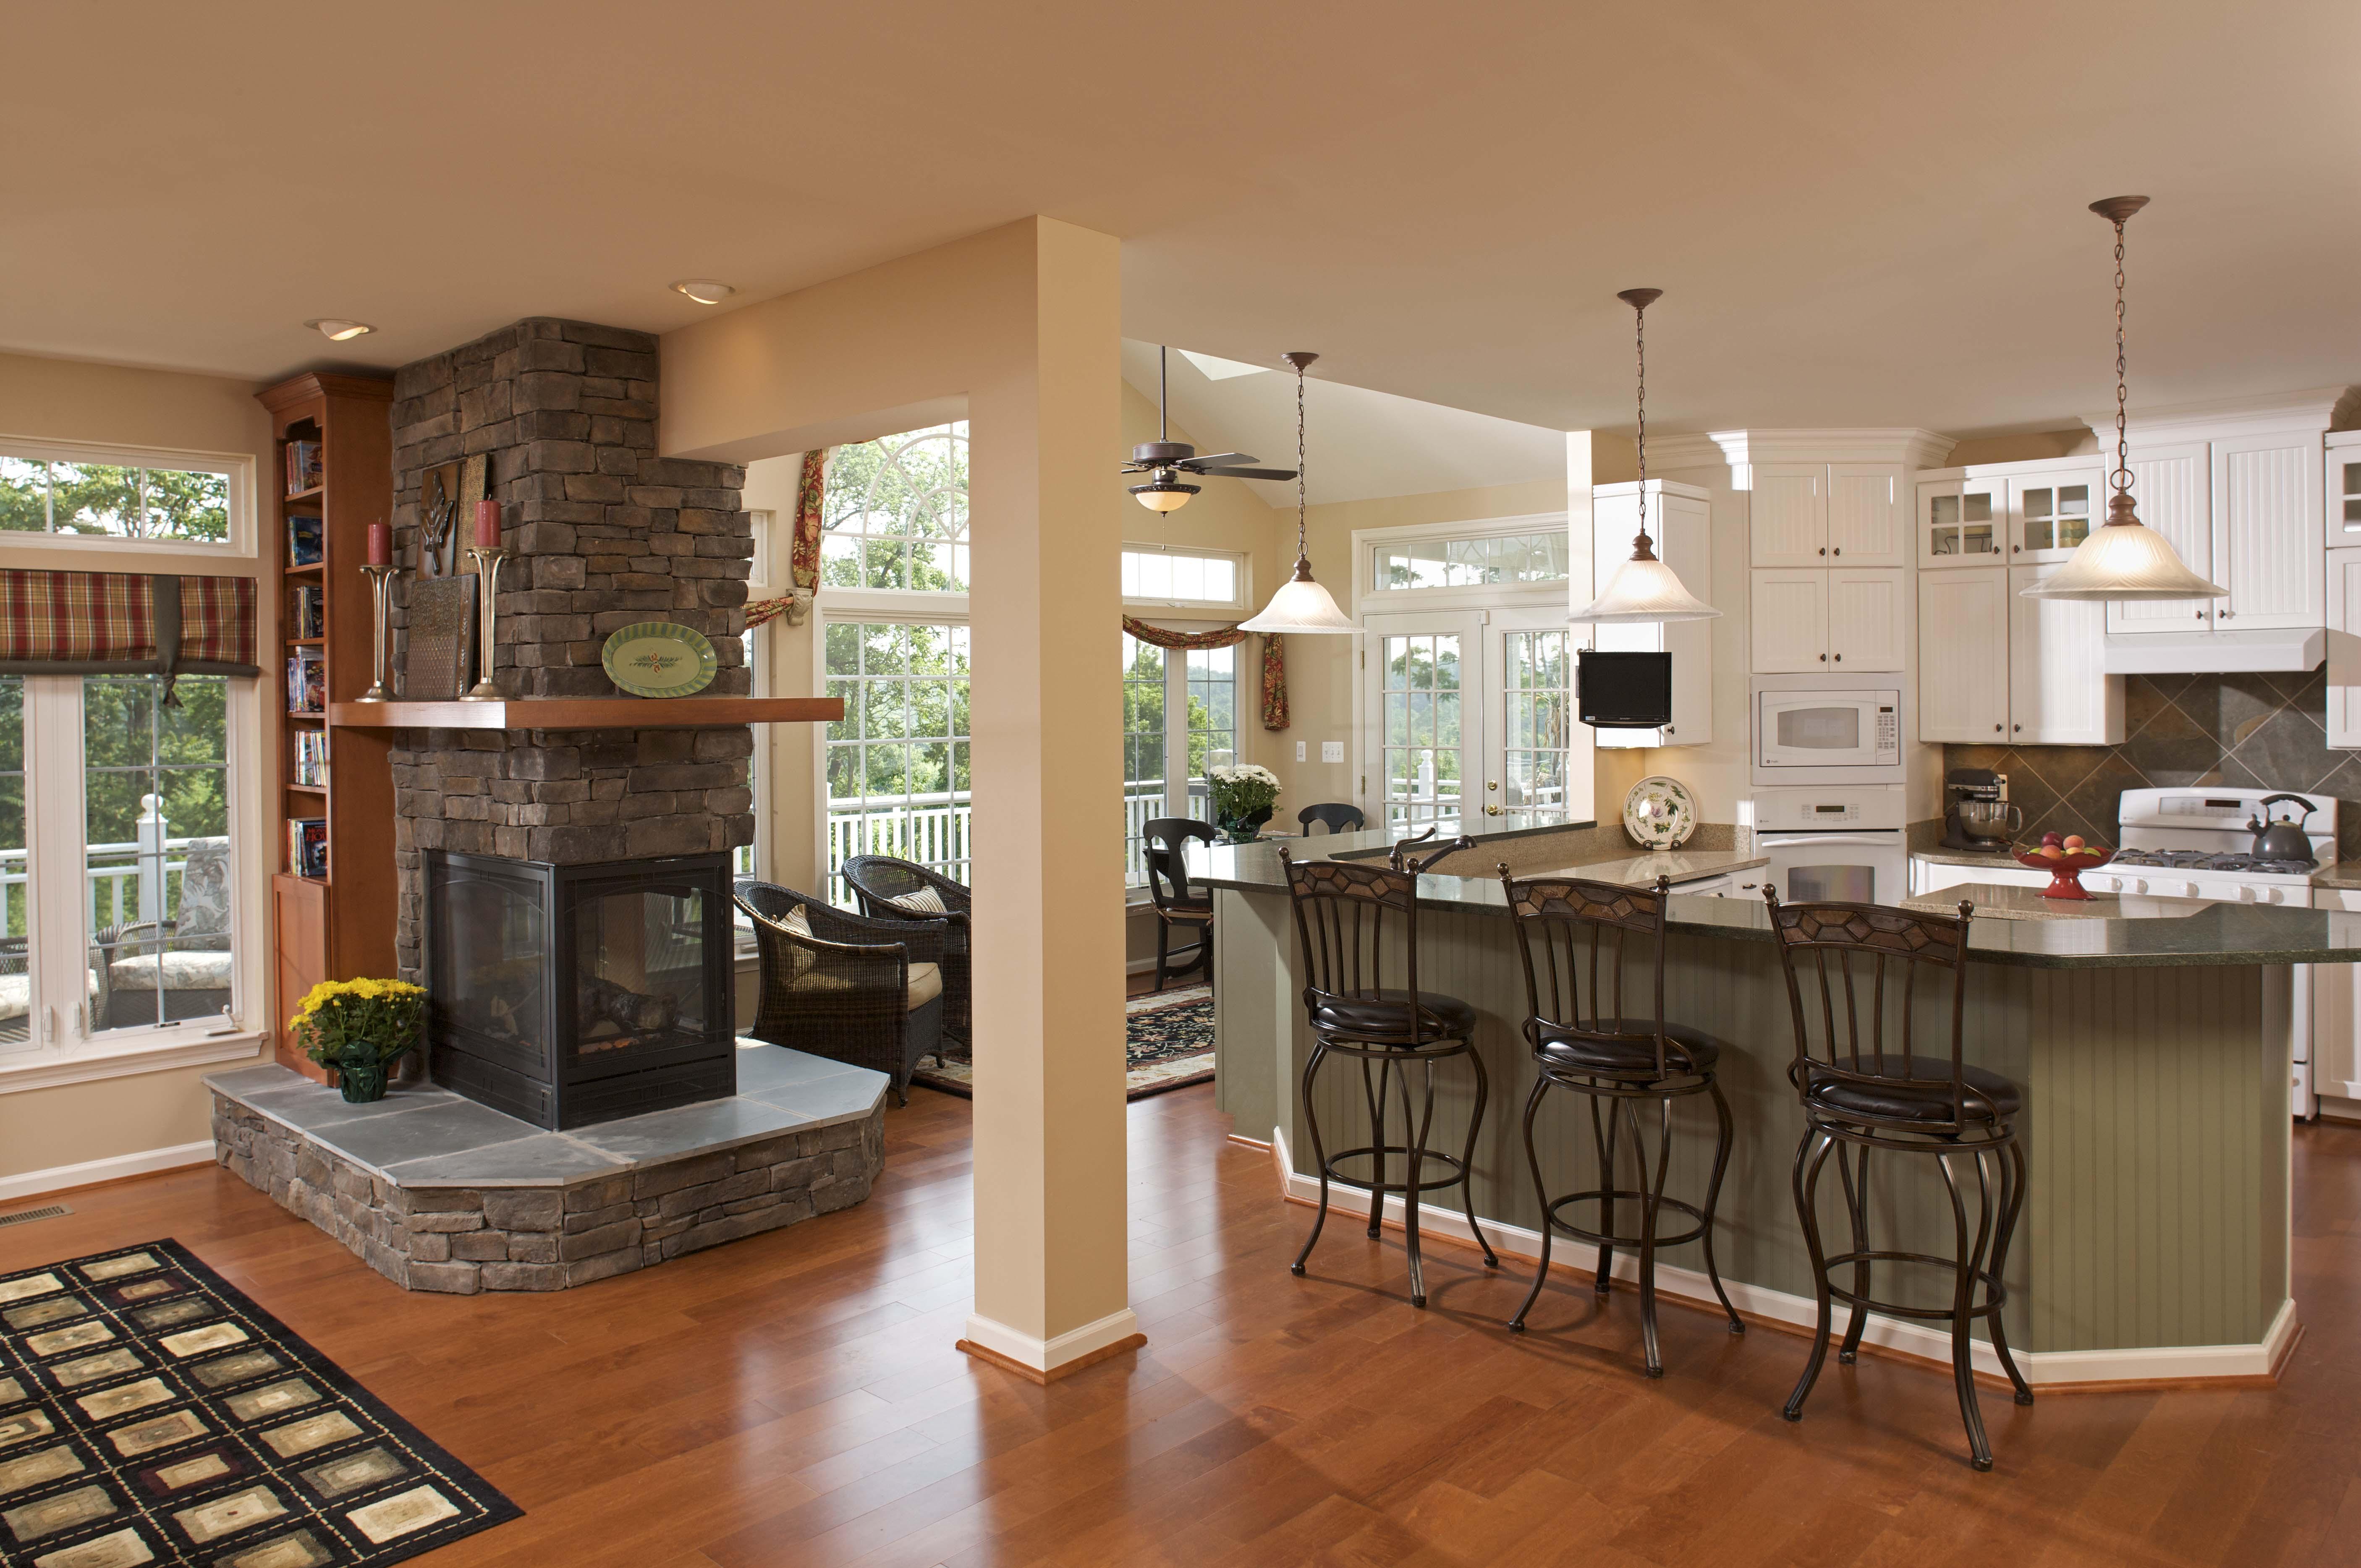 home renovation designs ideas mobile home remodeling ideas 2 minimalist home ILHSWPW